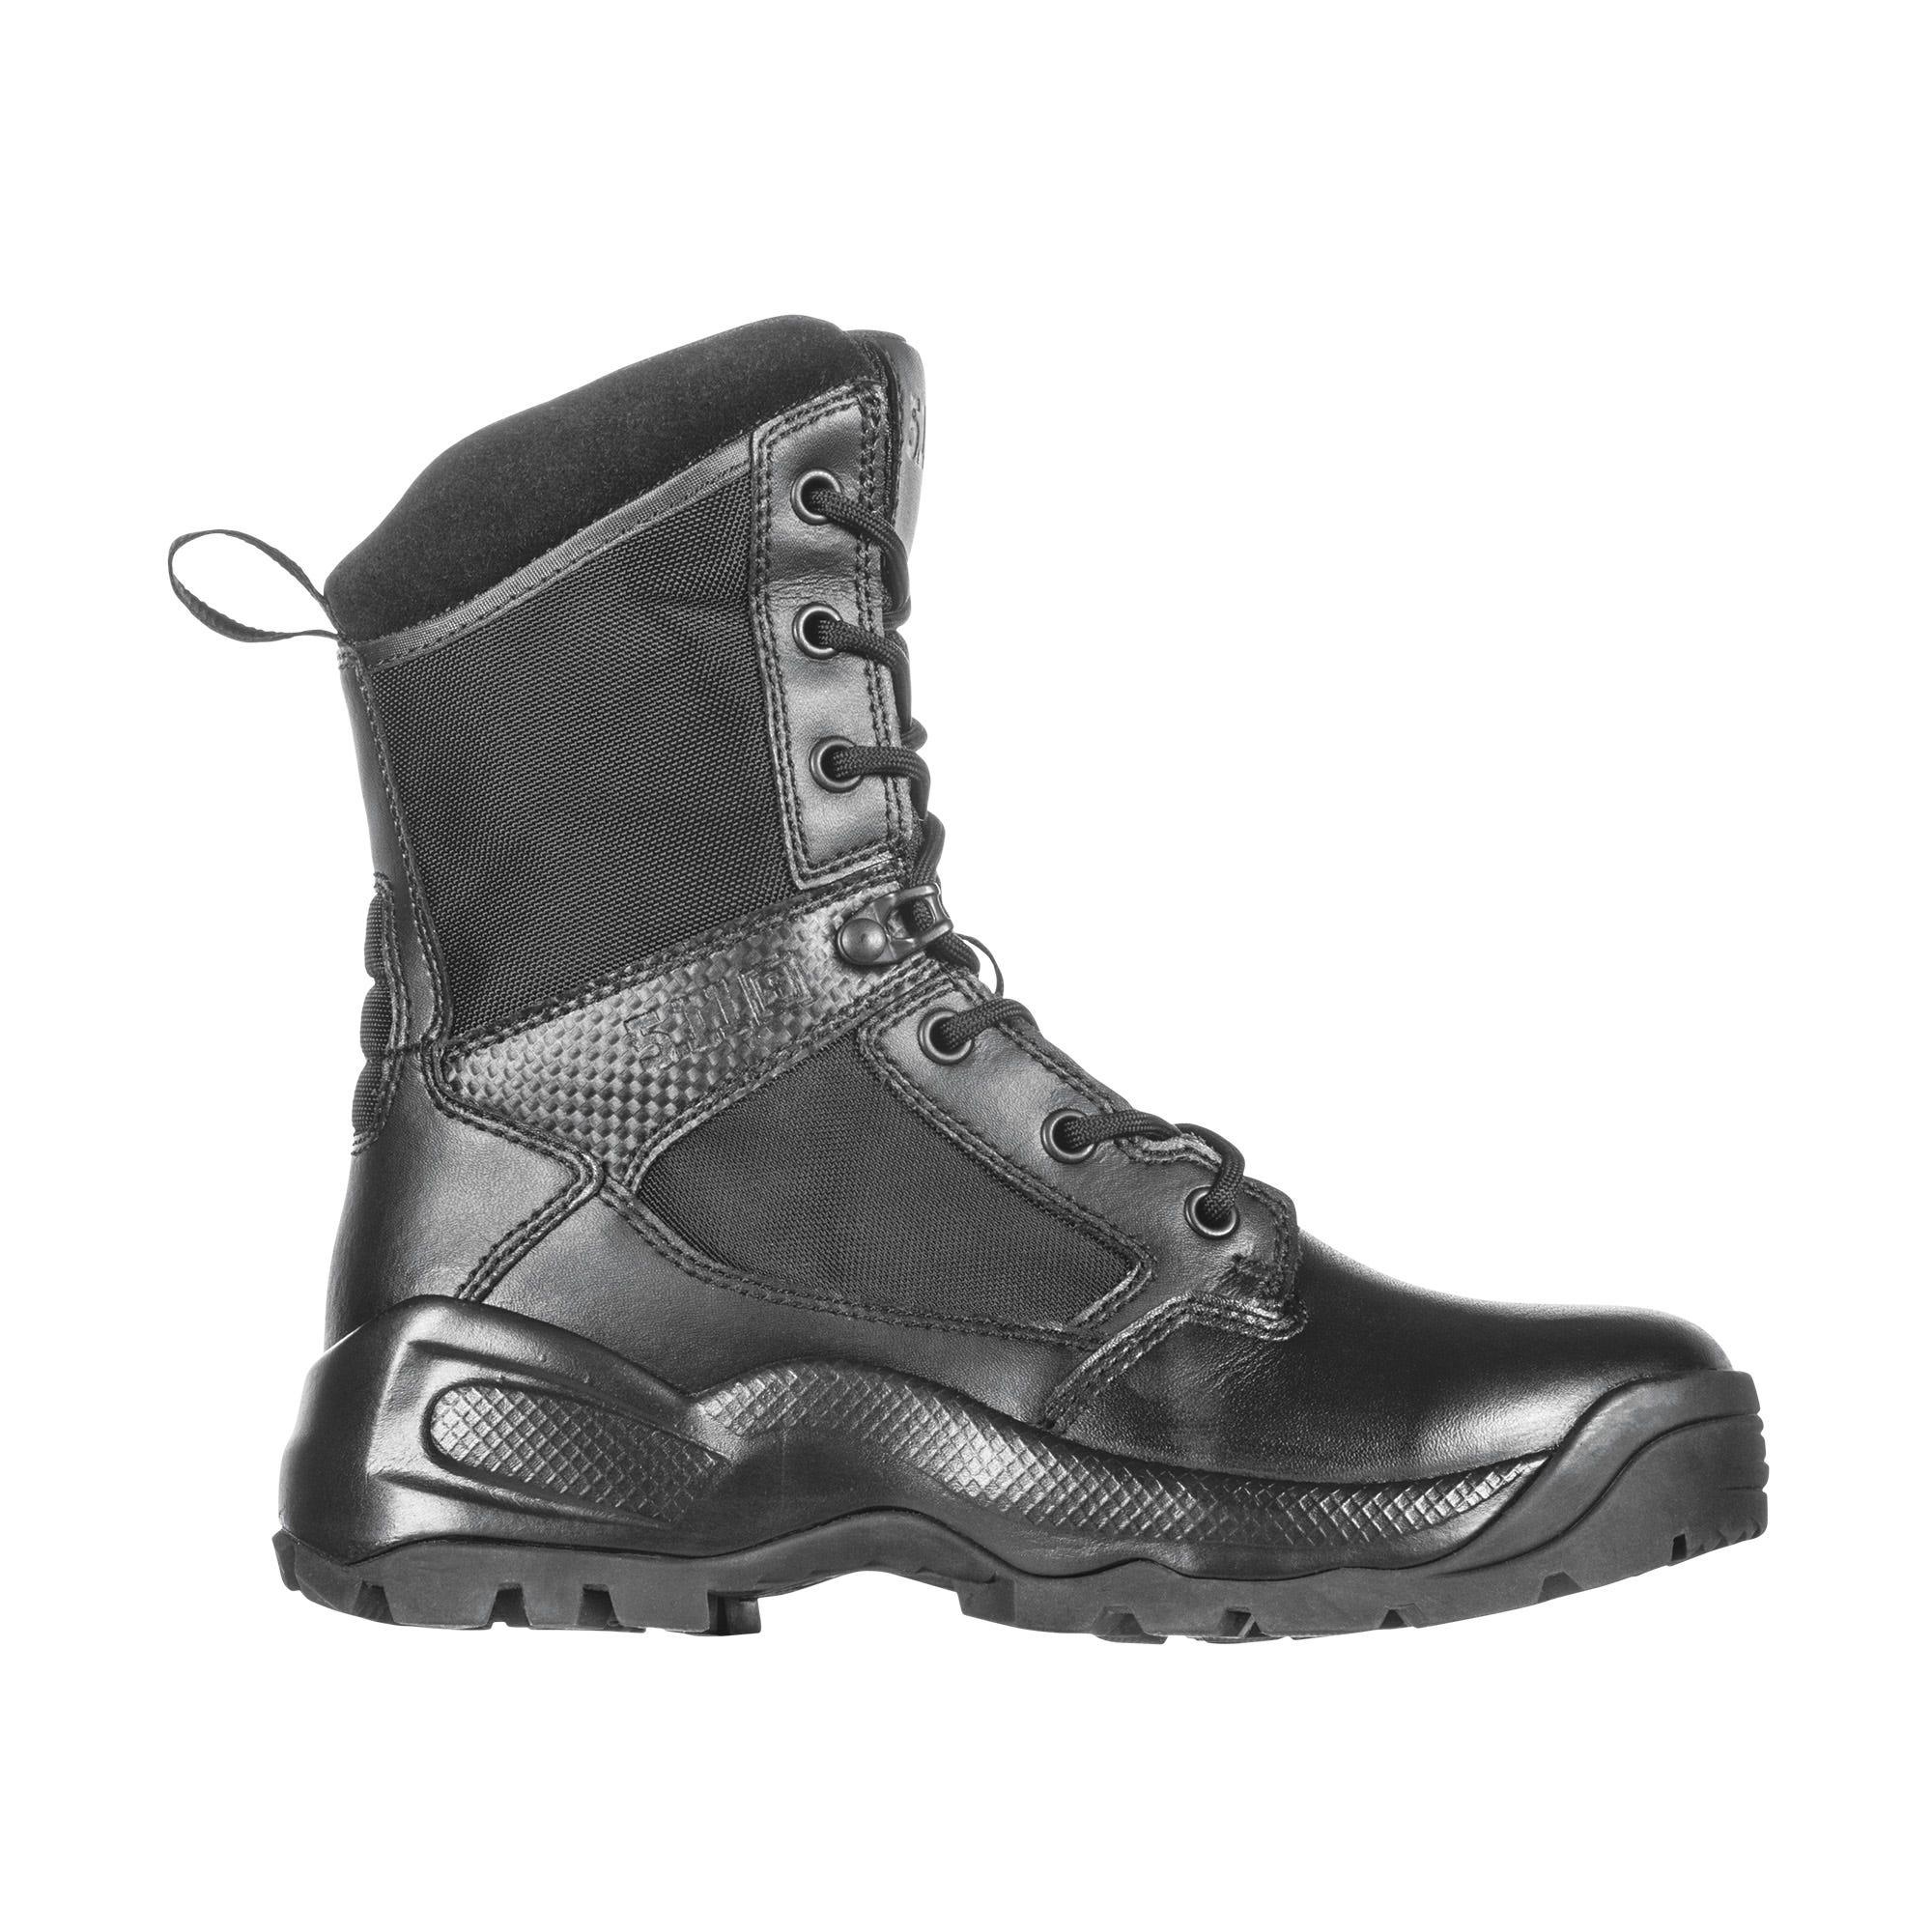 5.11 Tactical Women's Womens ATAC 2.0 8 Side Zip Boot thumbnail